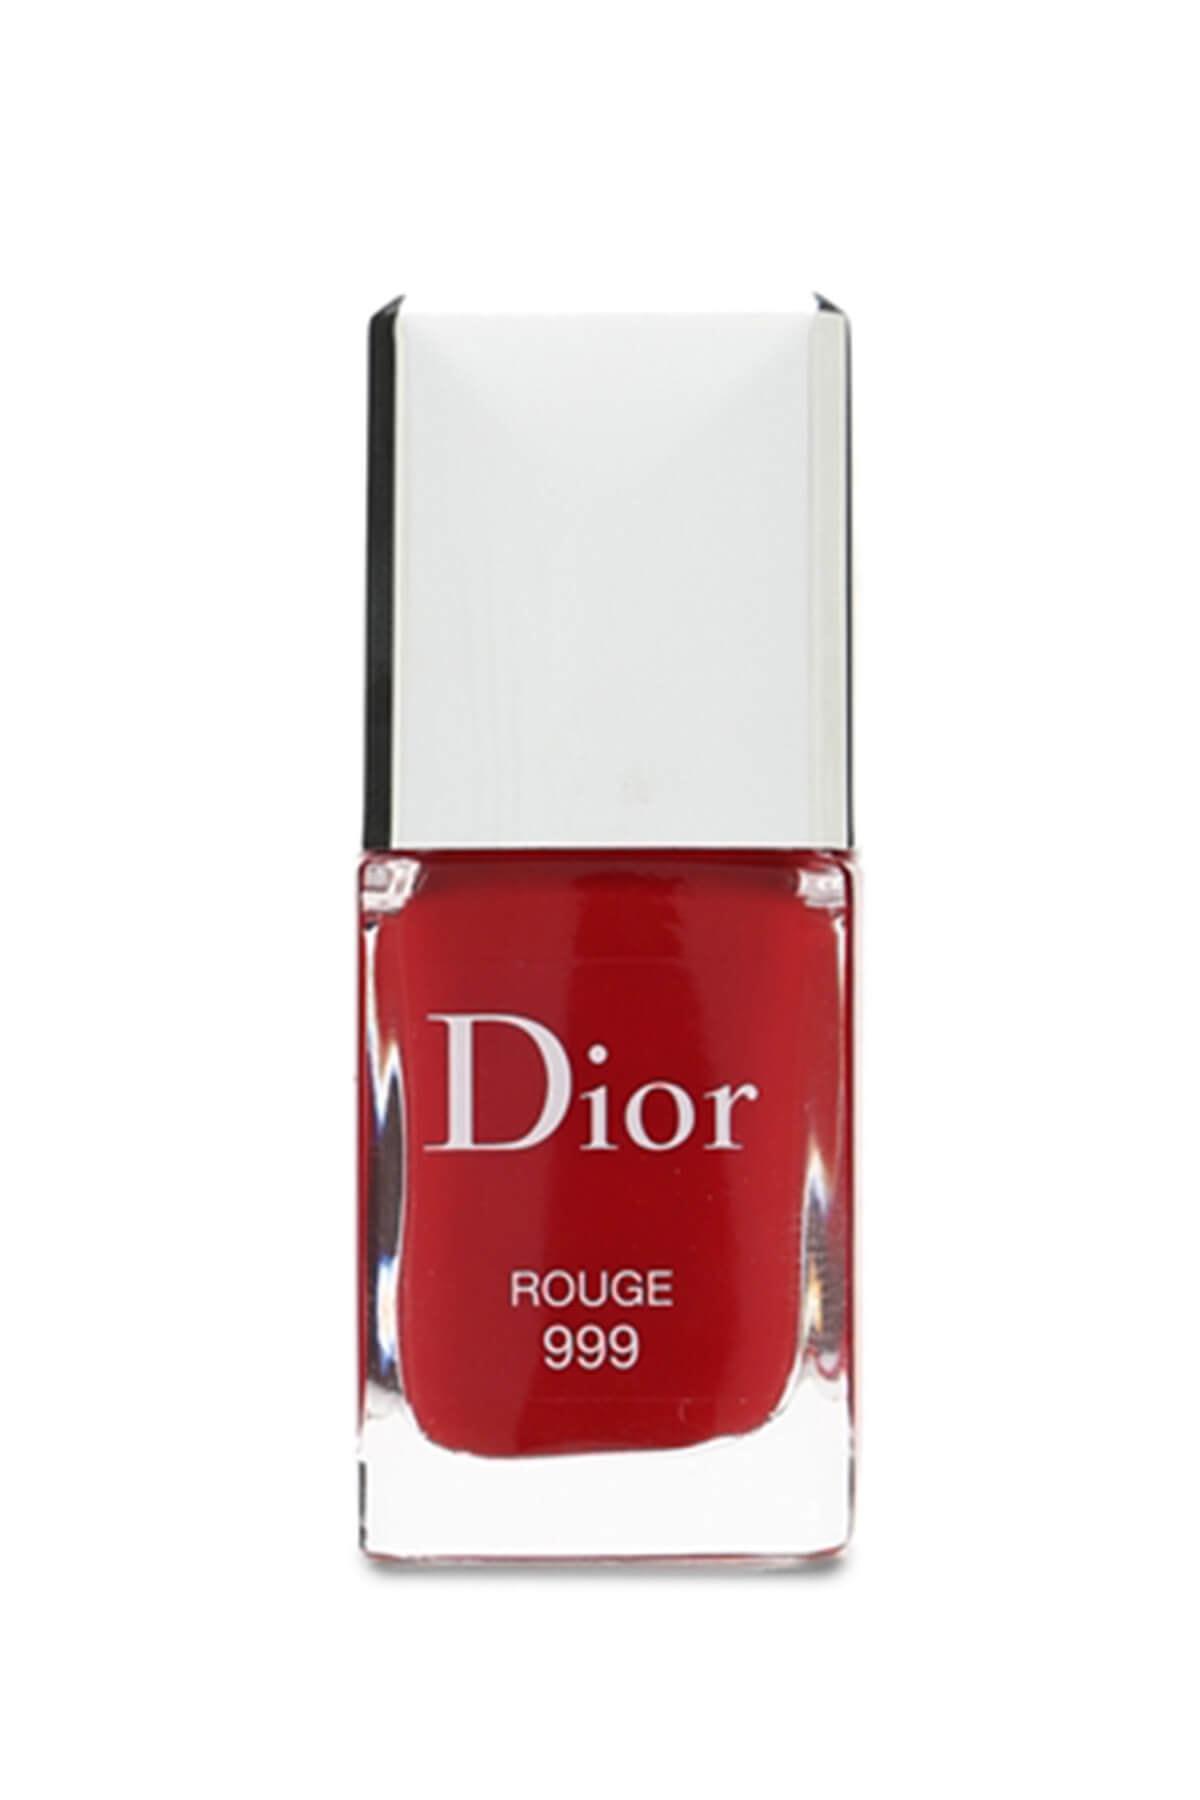 Dior Oje - Vernis 999 Rouge 3348901207980 1